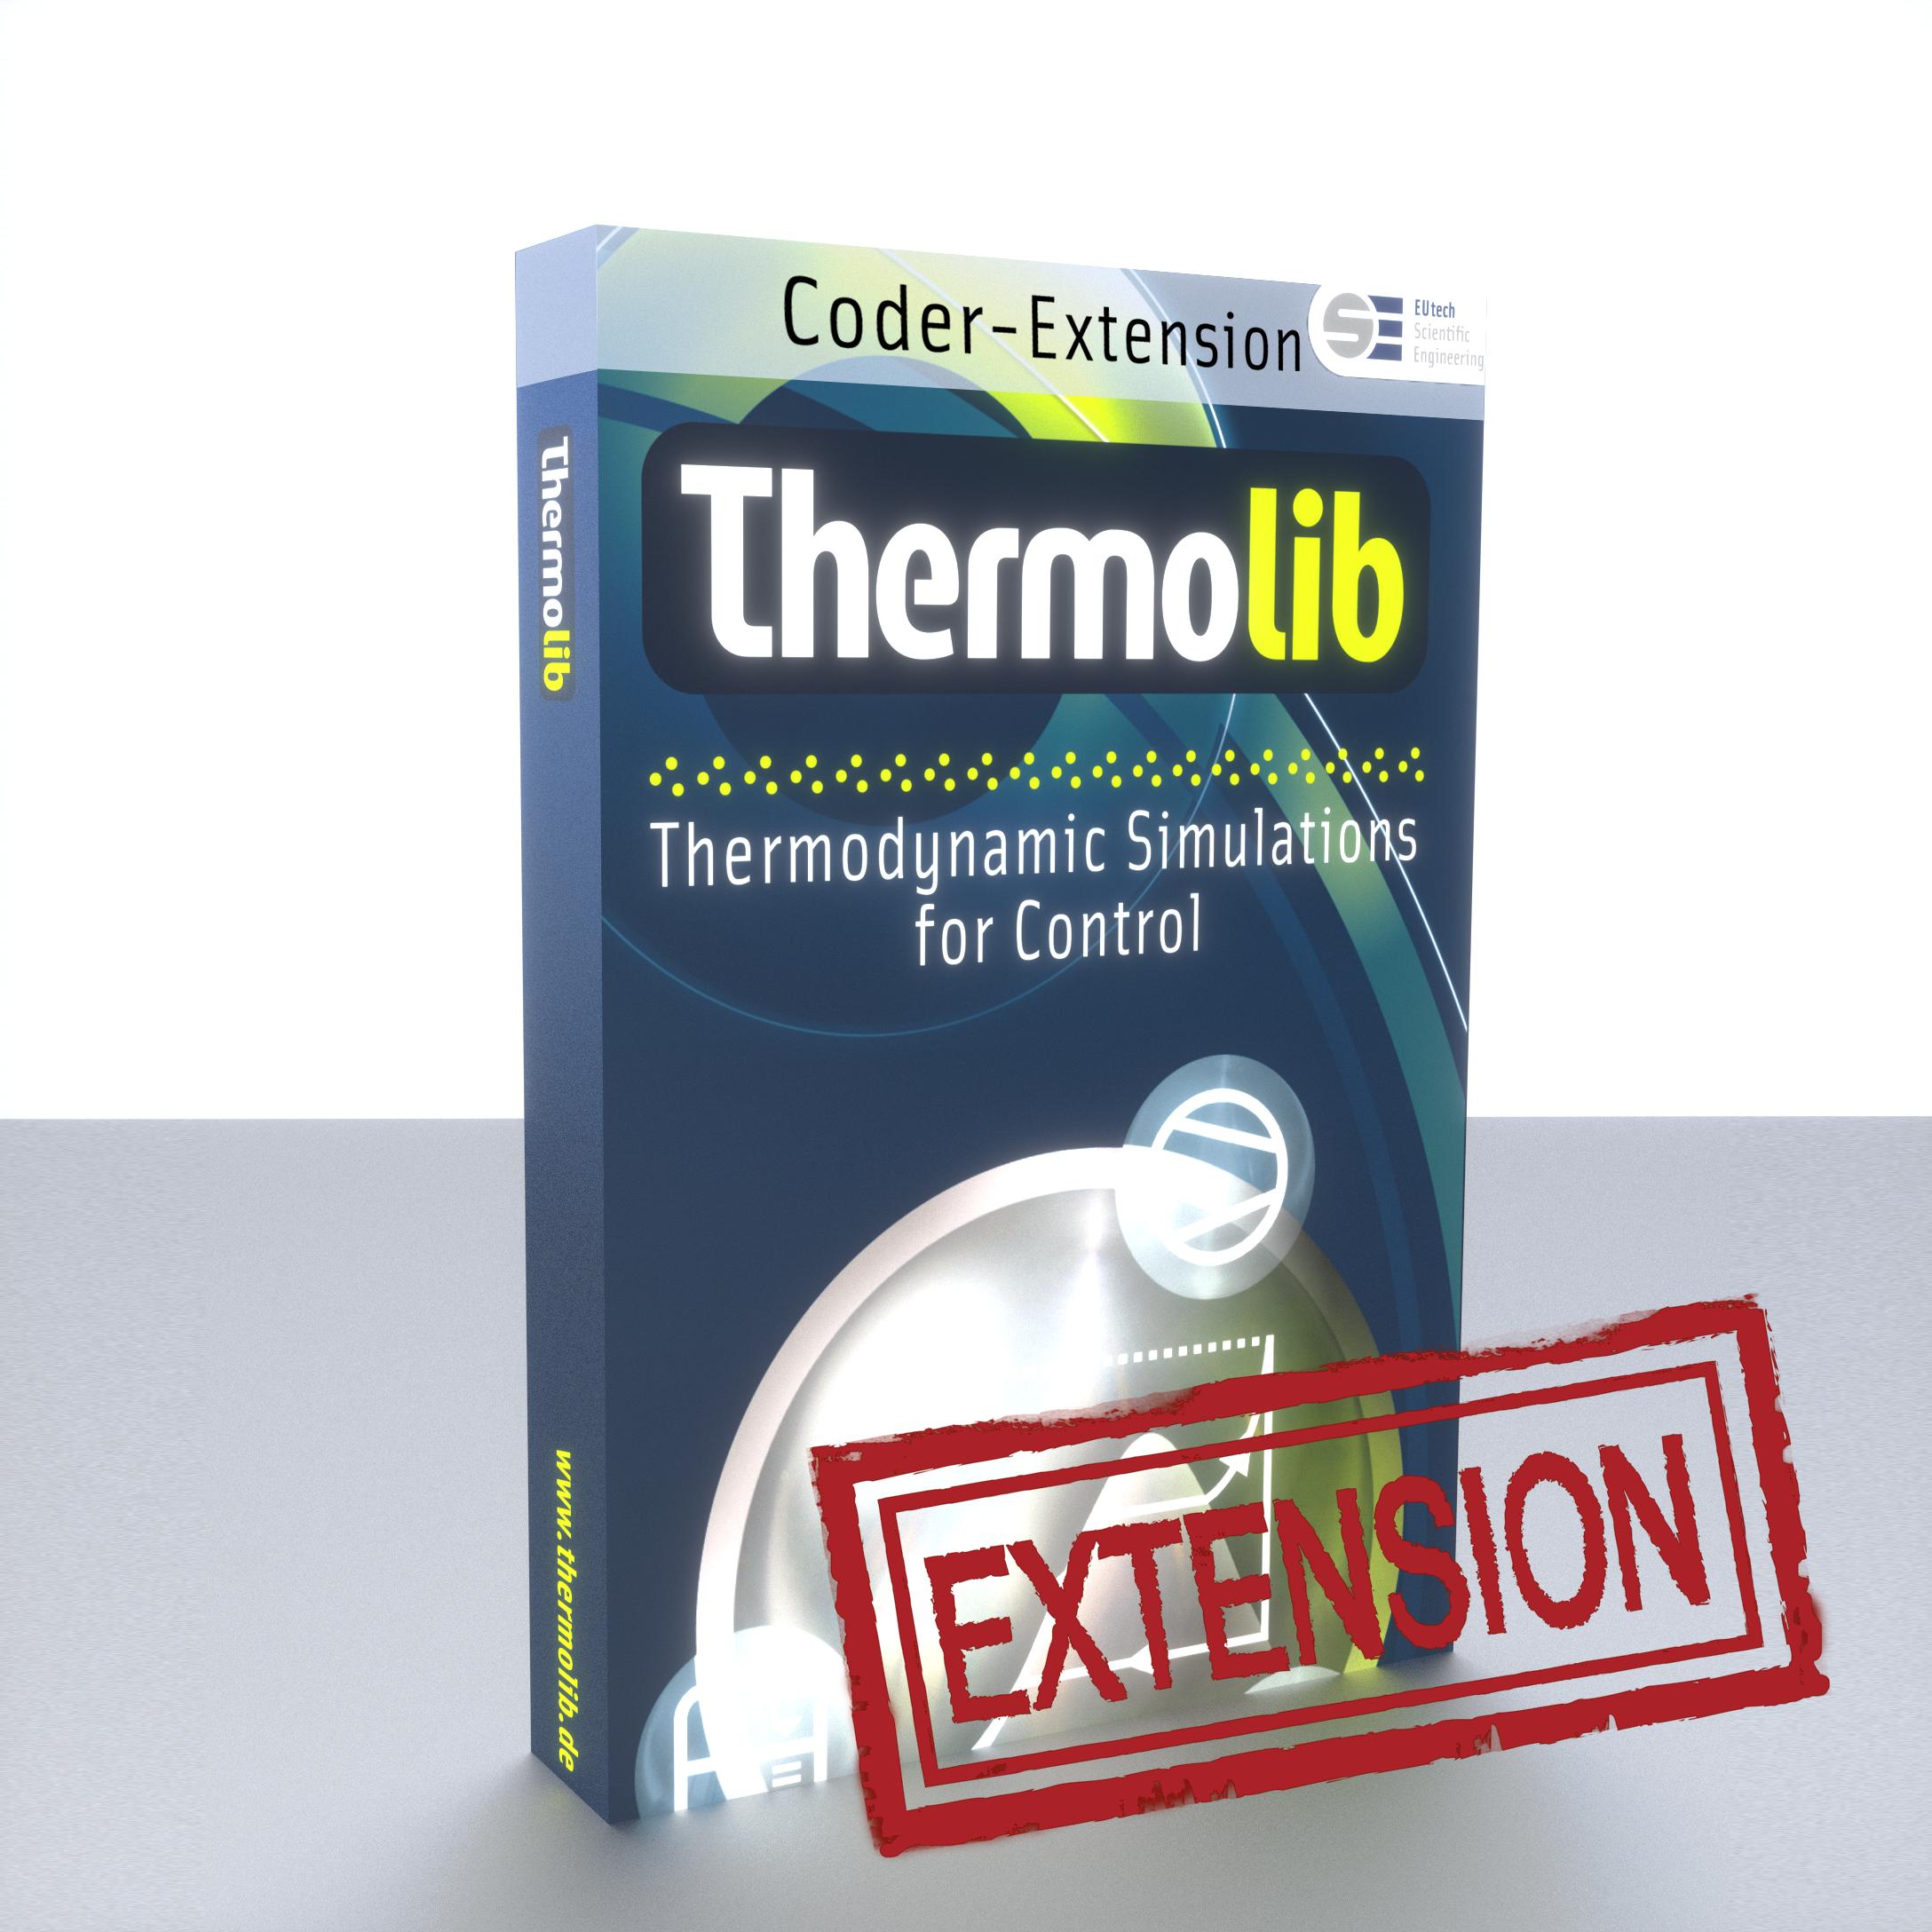 Thermolib Coder Extentsion